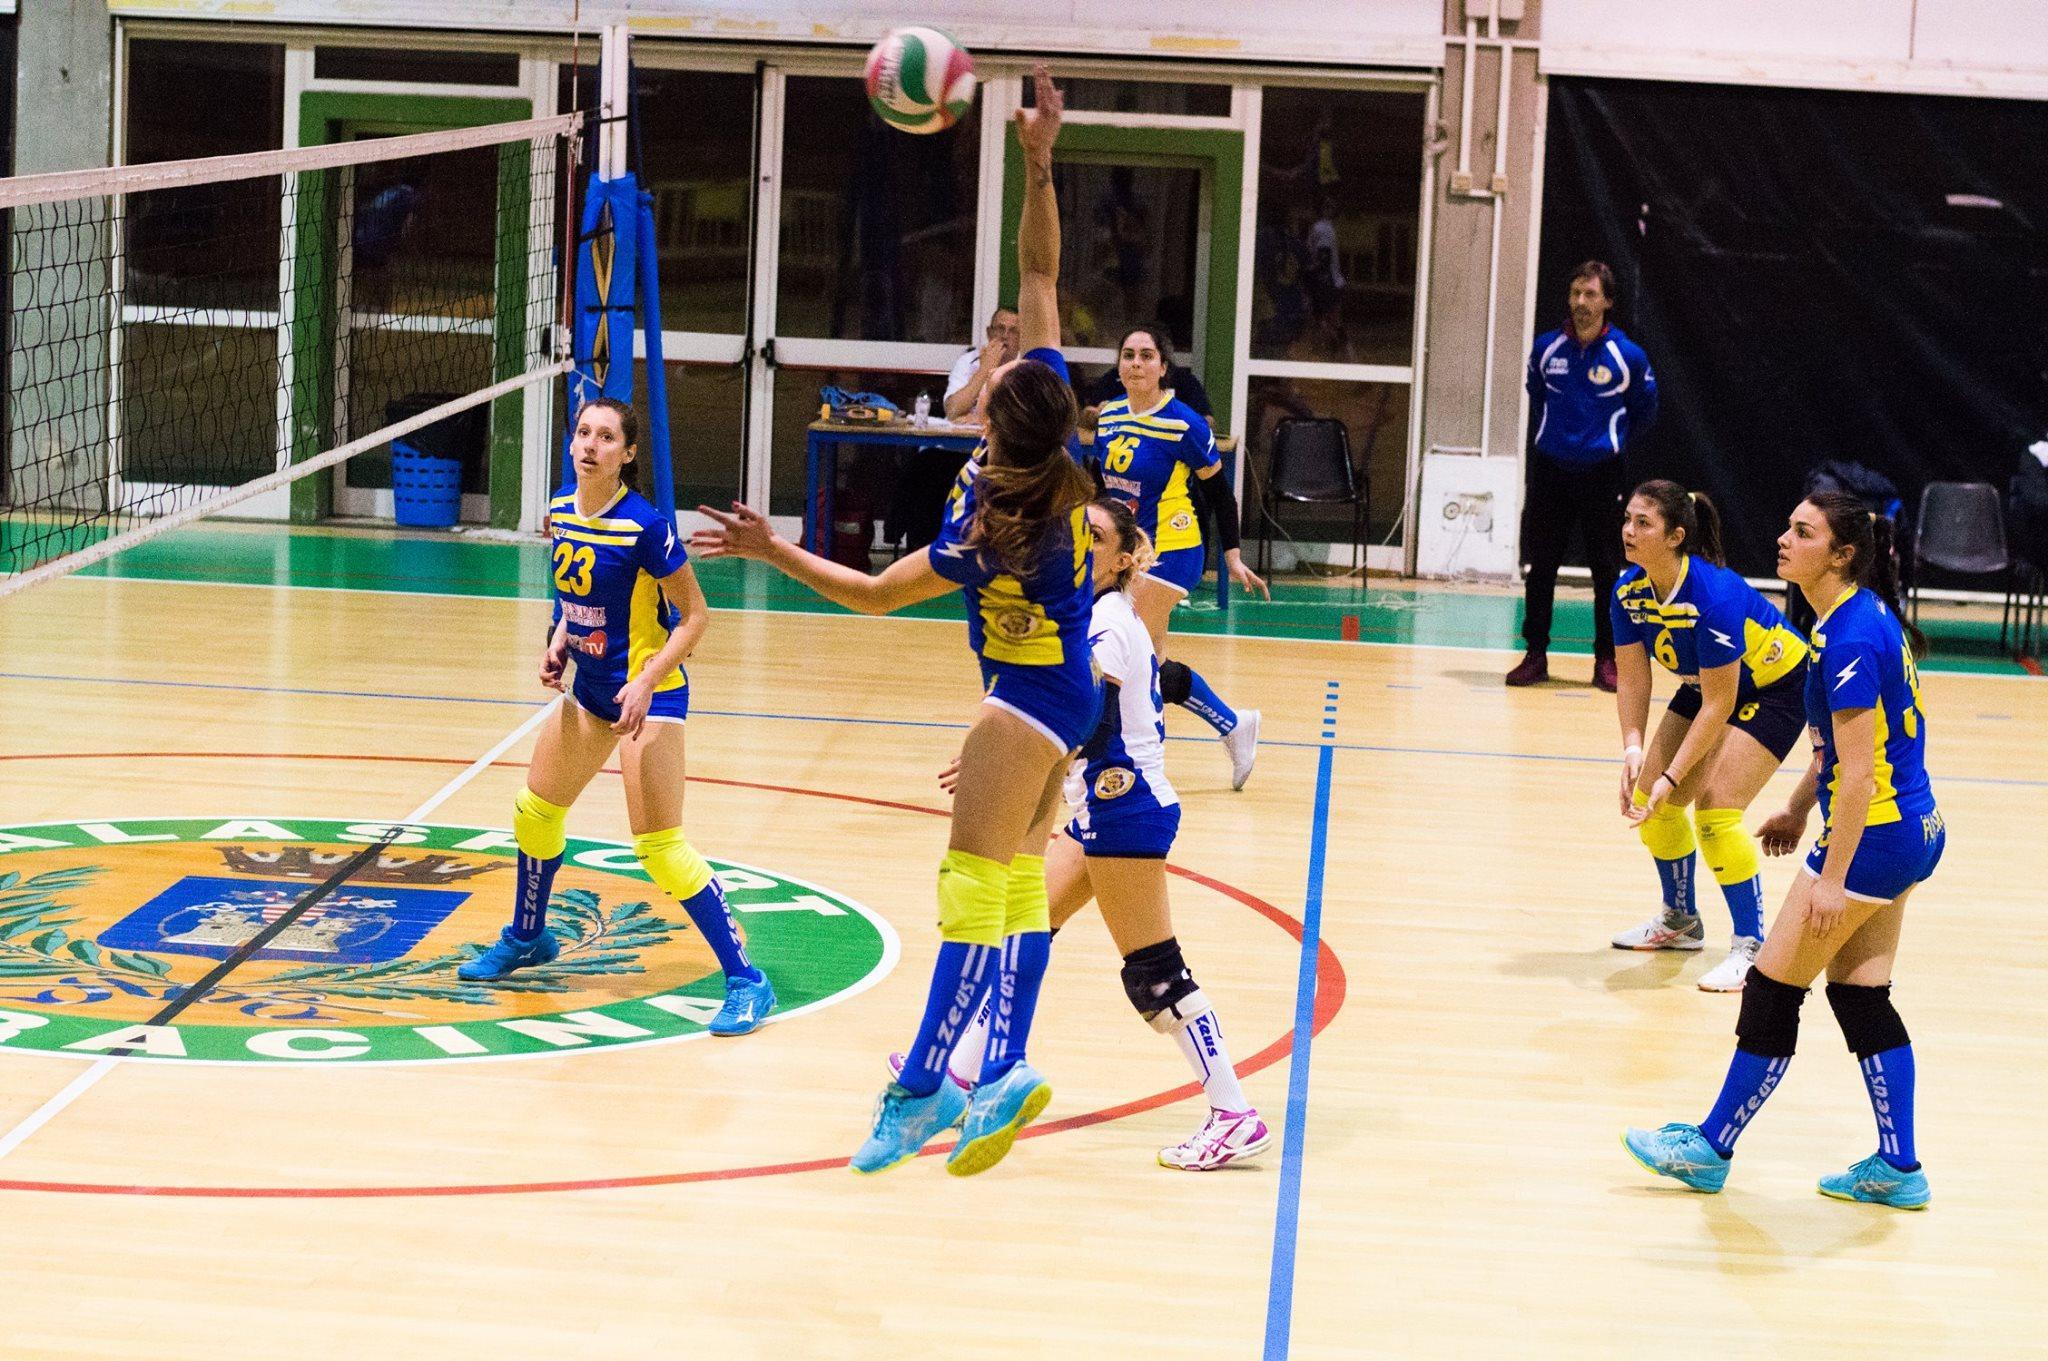 serie-c-regionale-femminile-futura-terracina-sconfitta-nel-derby